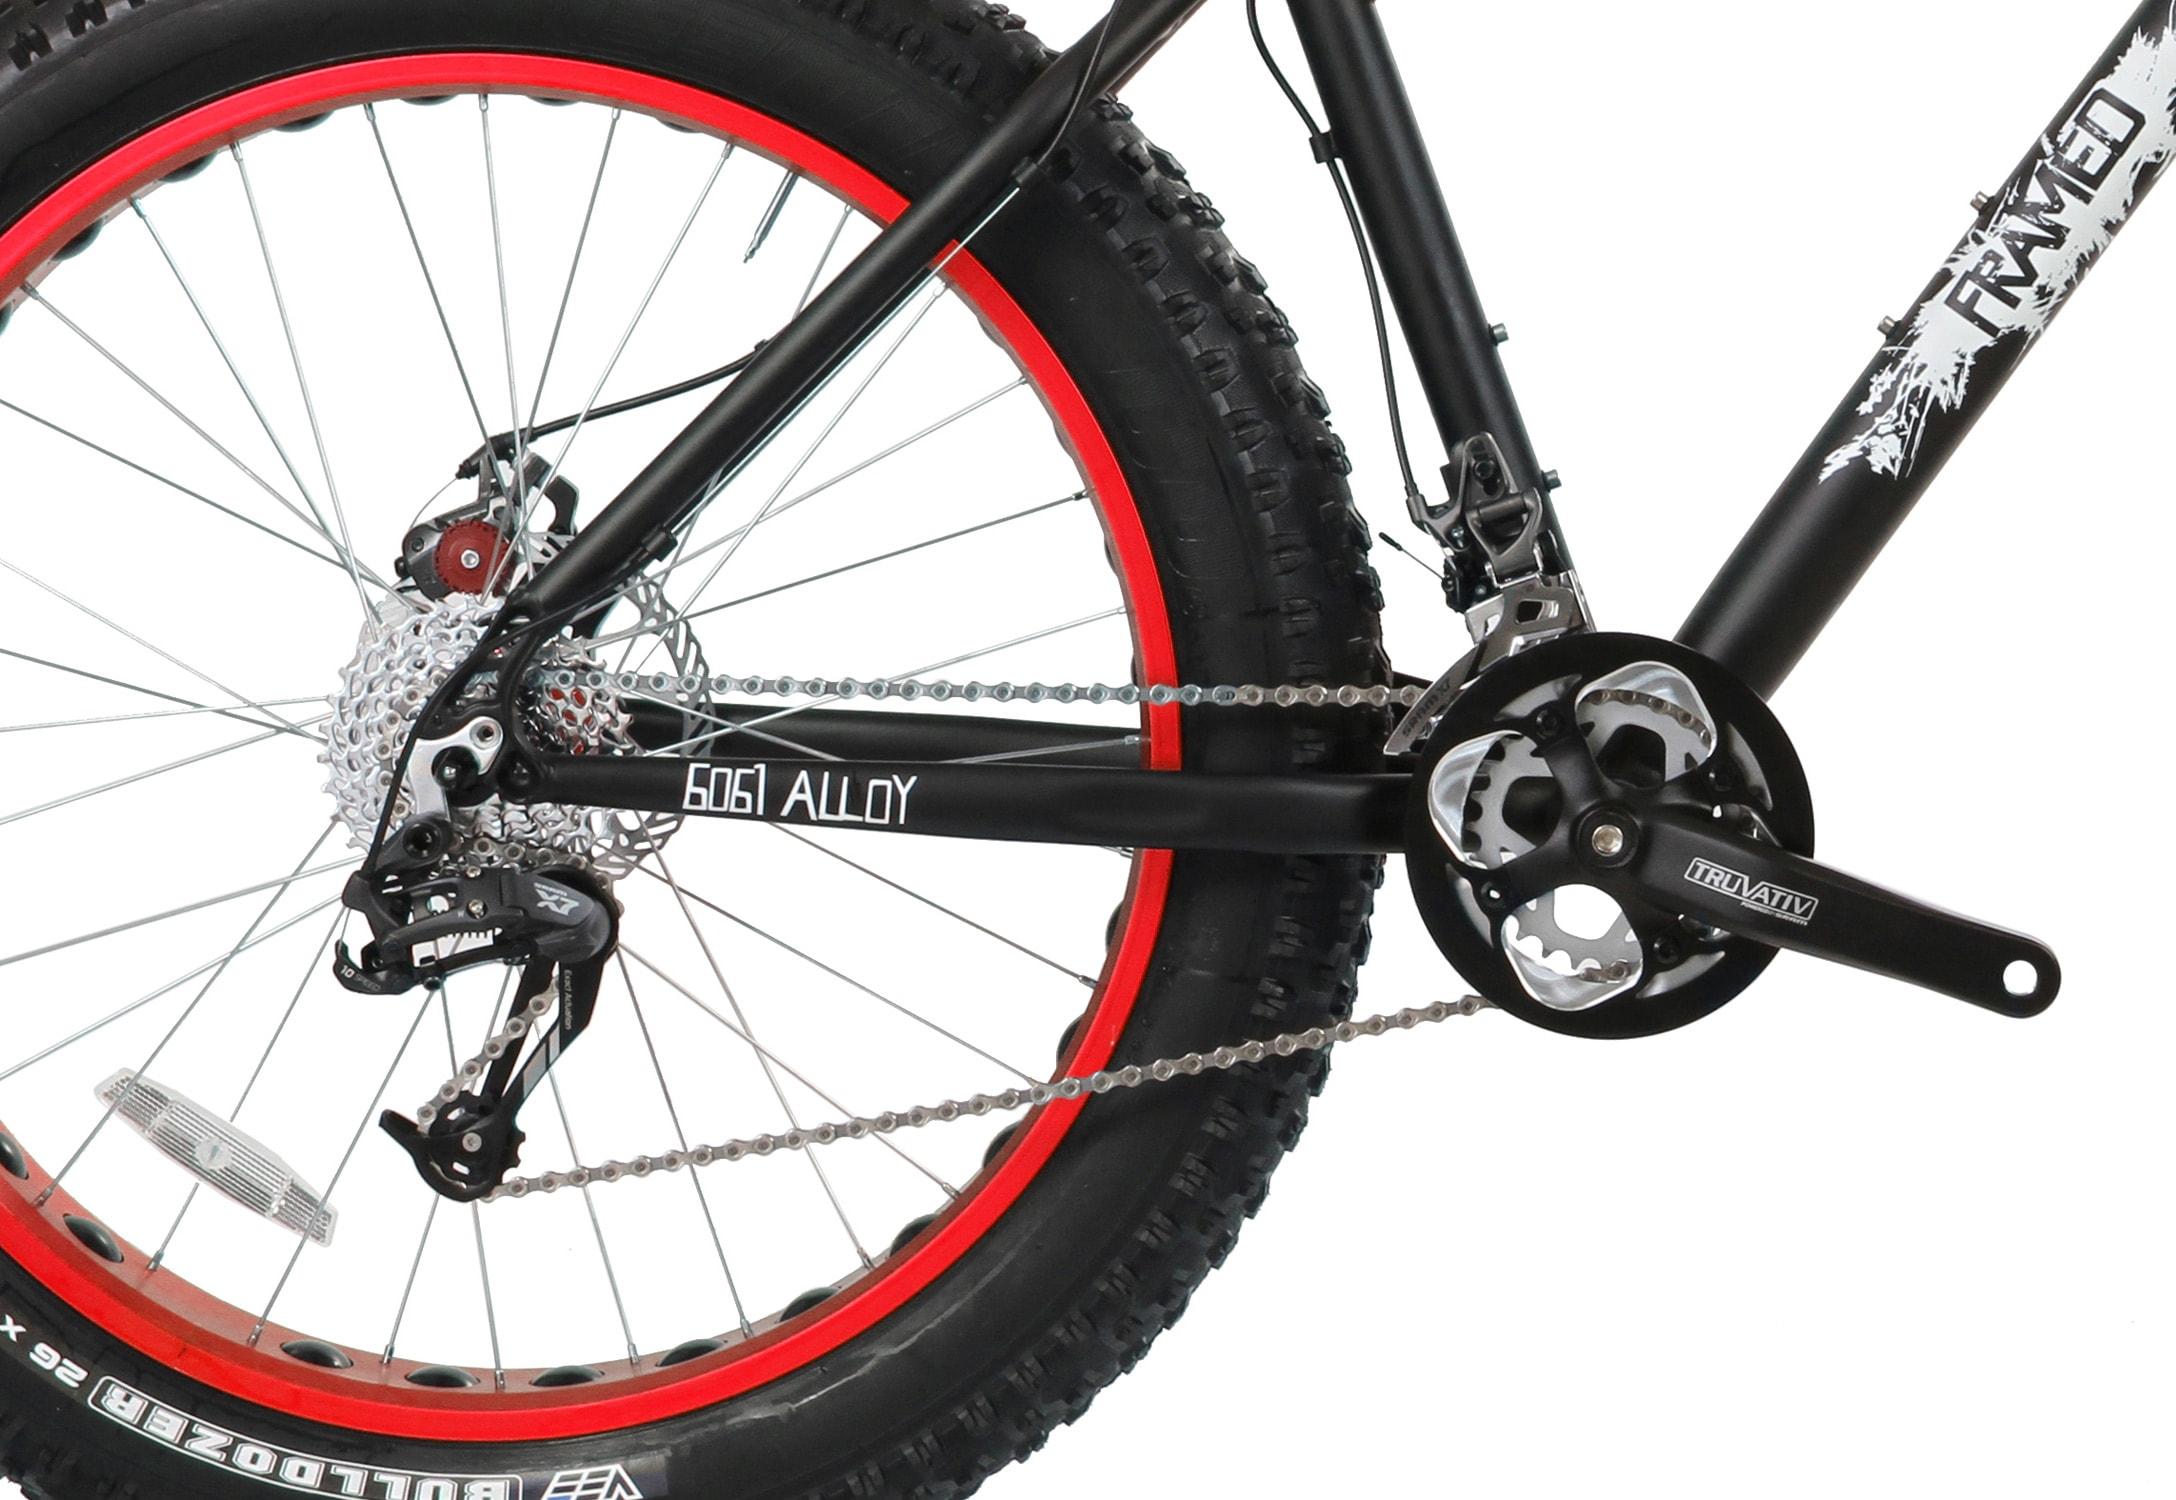 On Sale Framed Minnesota 3.0 XWT Fat Bike w/ Bluto Fork up to 50% off